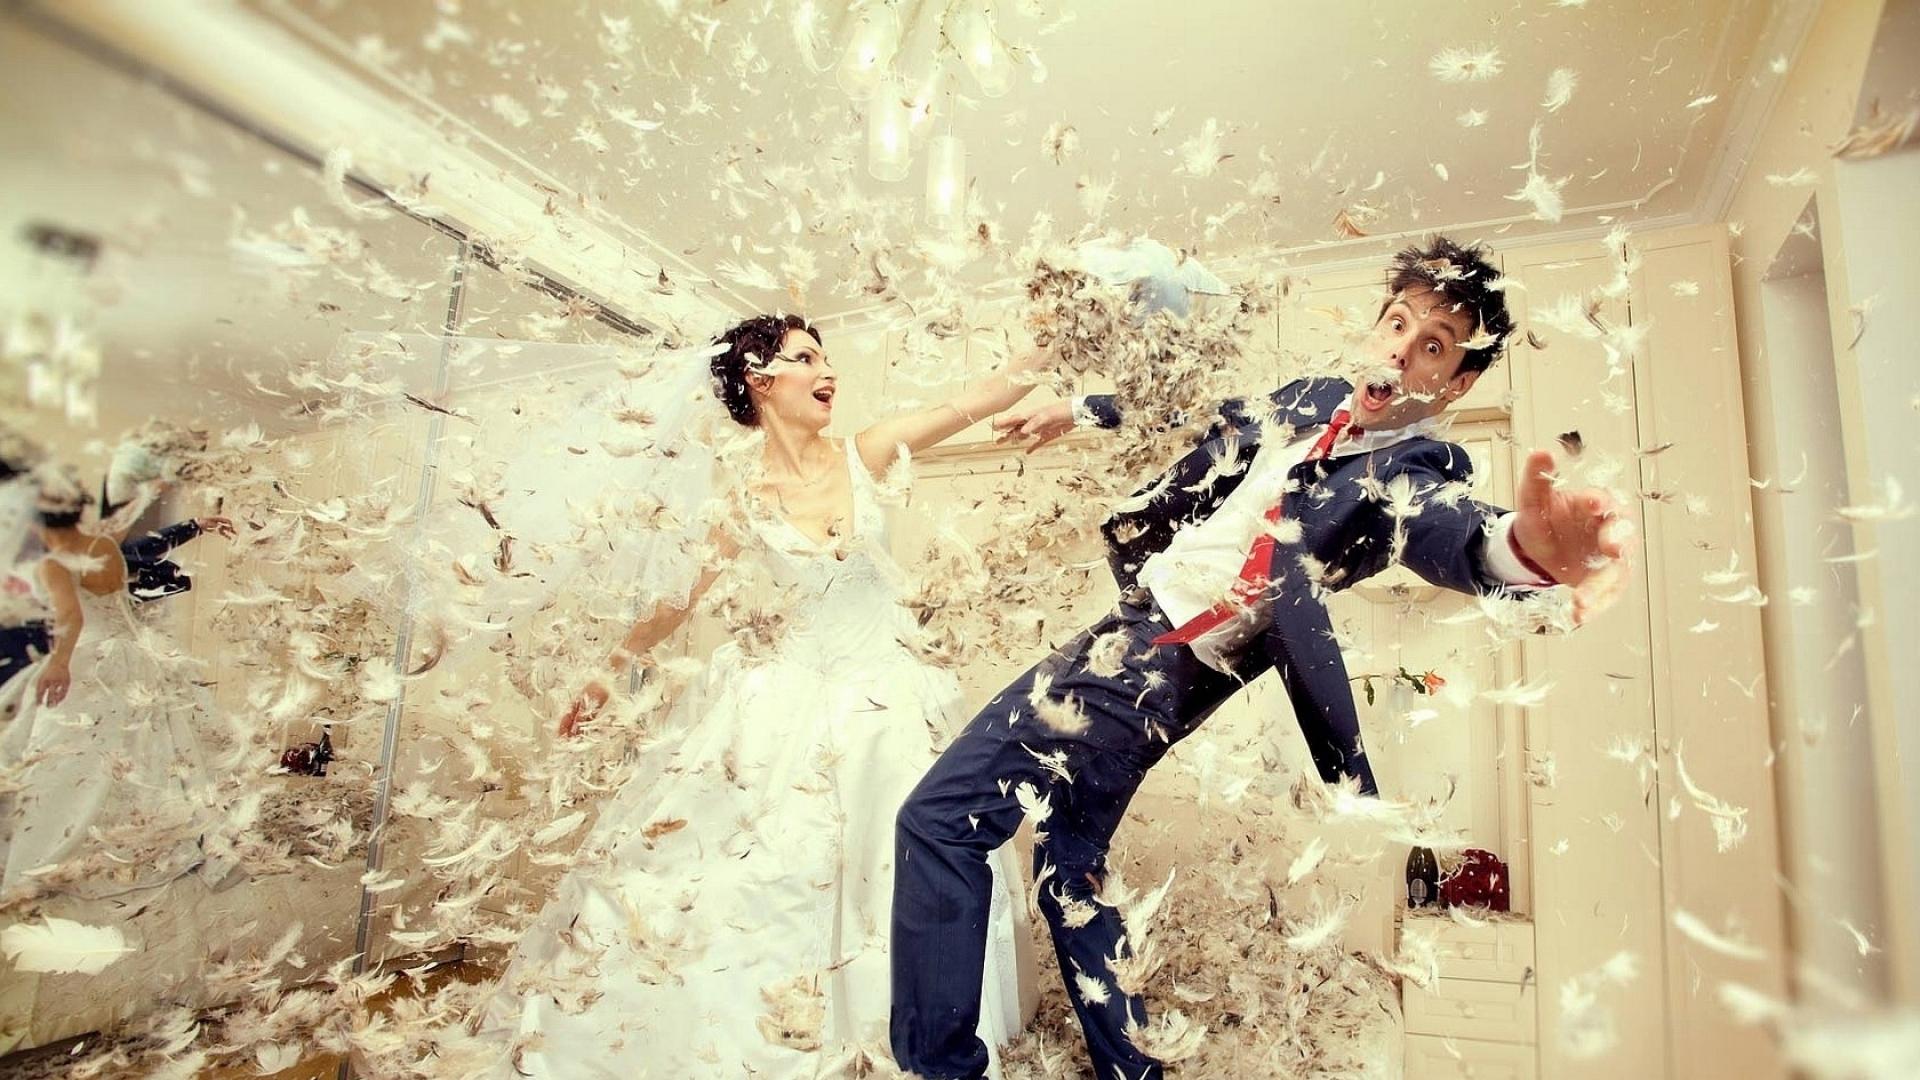 Download Wallpaper 1920x1080 Wedding Down Bride Groom Dress Fight Full Hd 1080p Hd Background